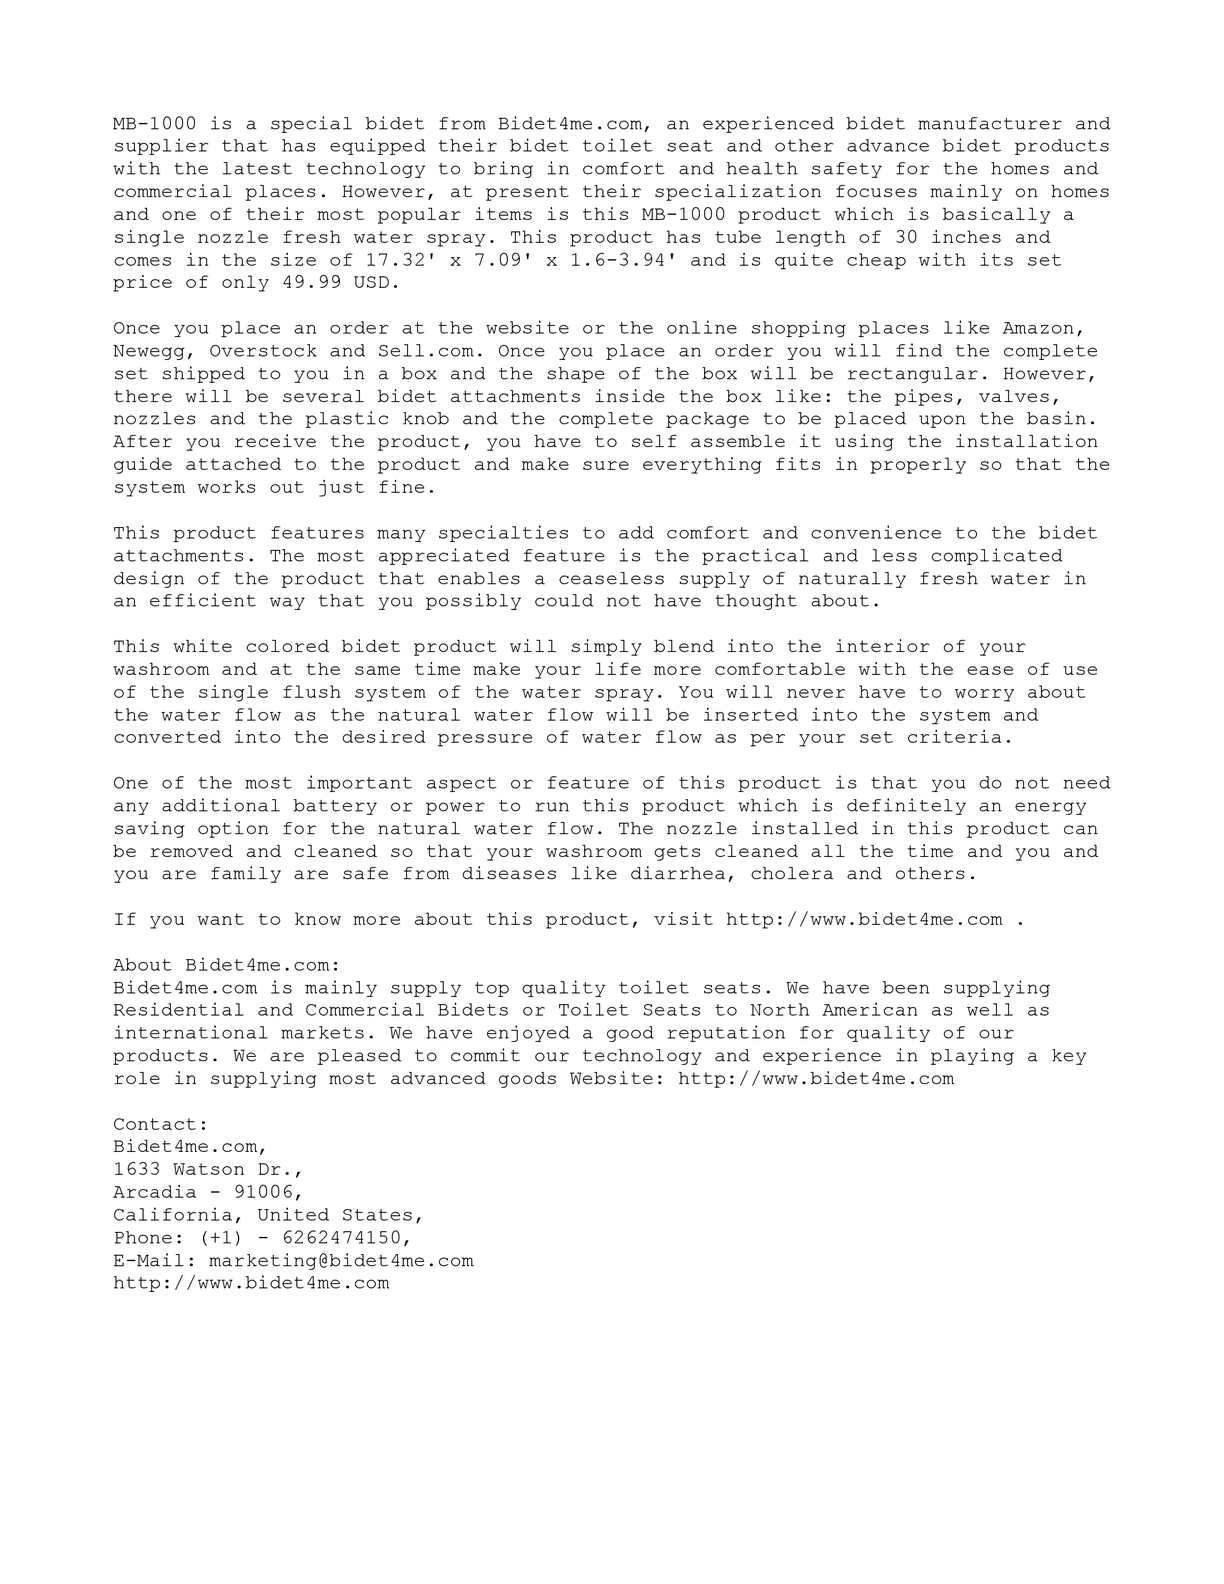 Astounding Calameo Bidet4Me Mb 1000 Easy Bidet Review Machost Co Dining Chair Design Ideas Machostcouk